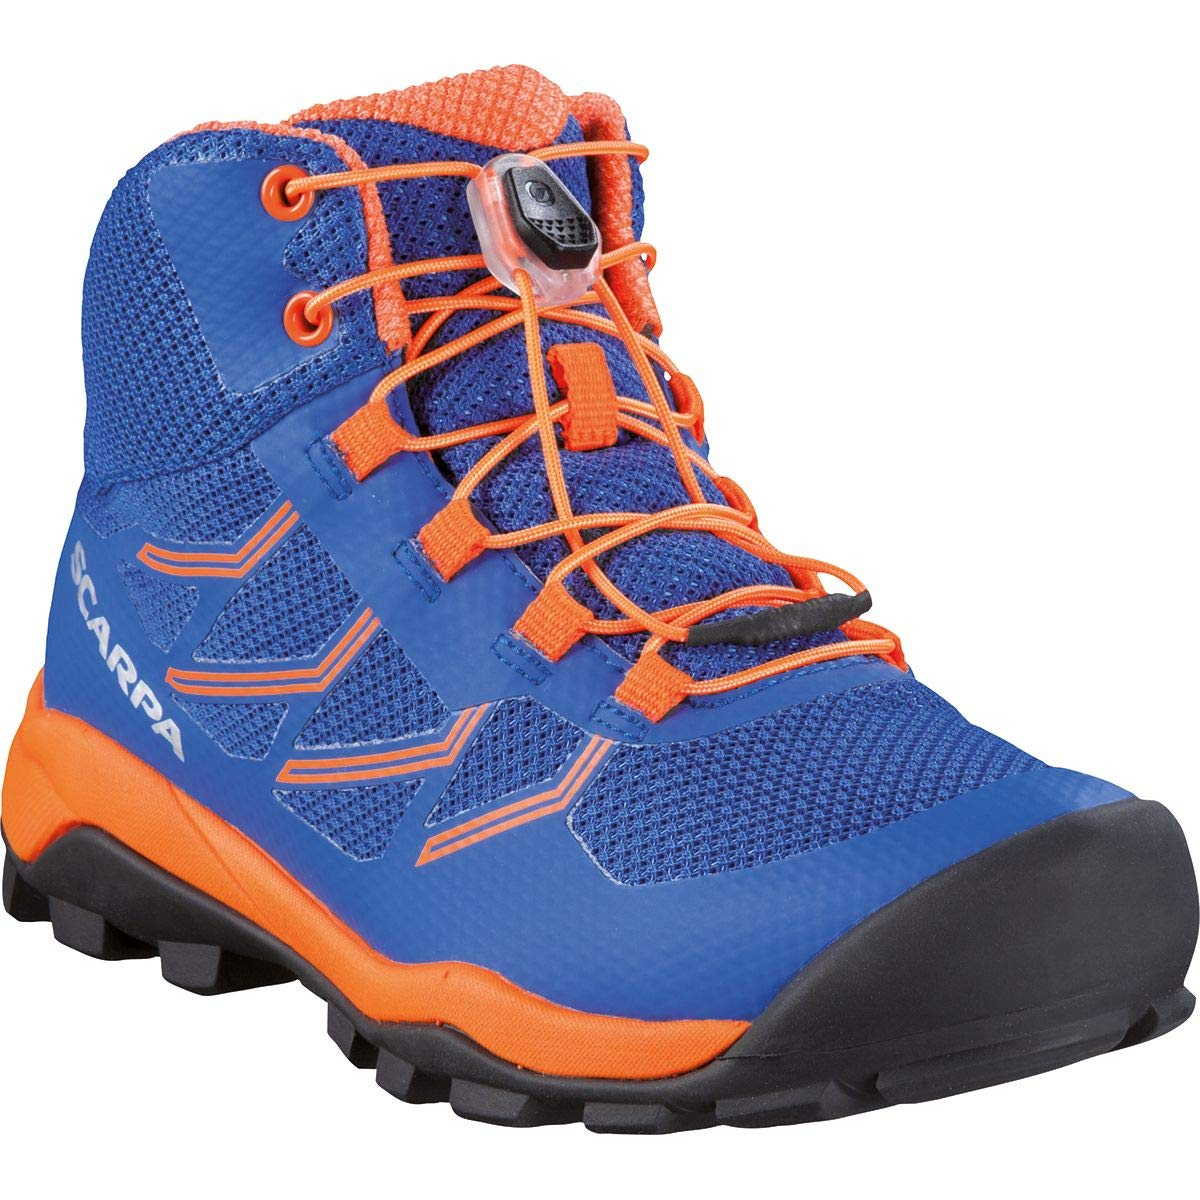 Scarpa Kinder Neutron mid wp Schuhe Wanderschuhe Trekkingschuhe